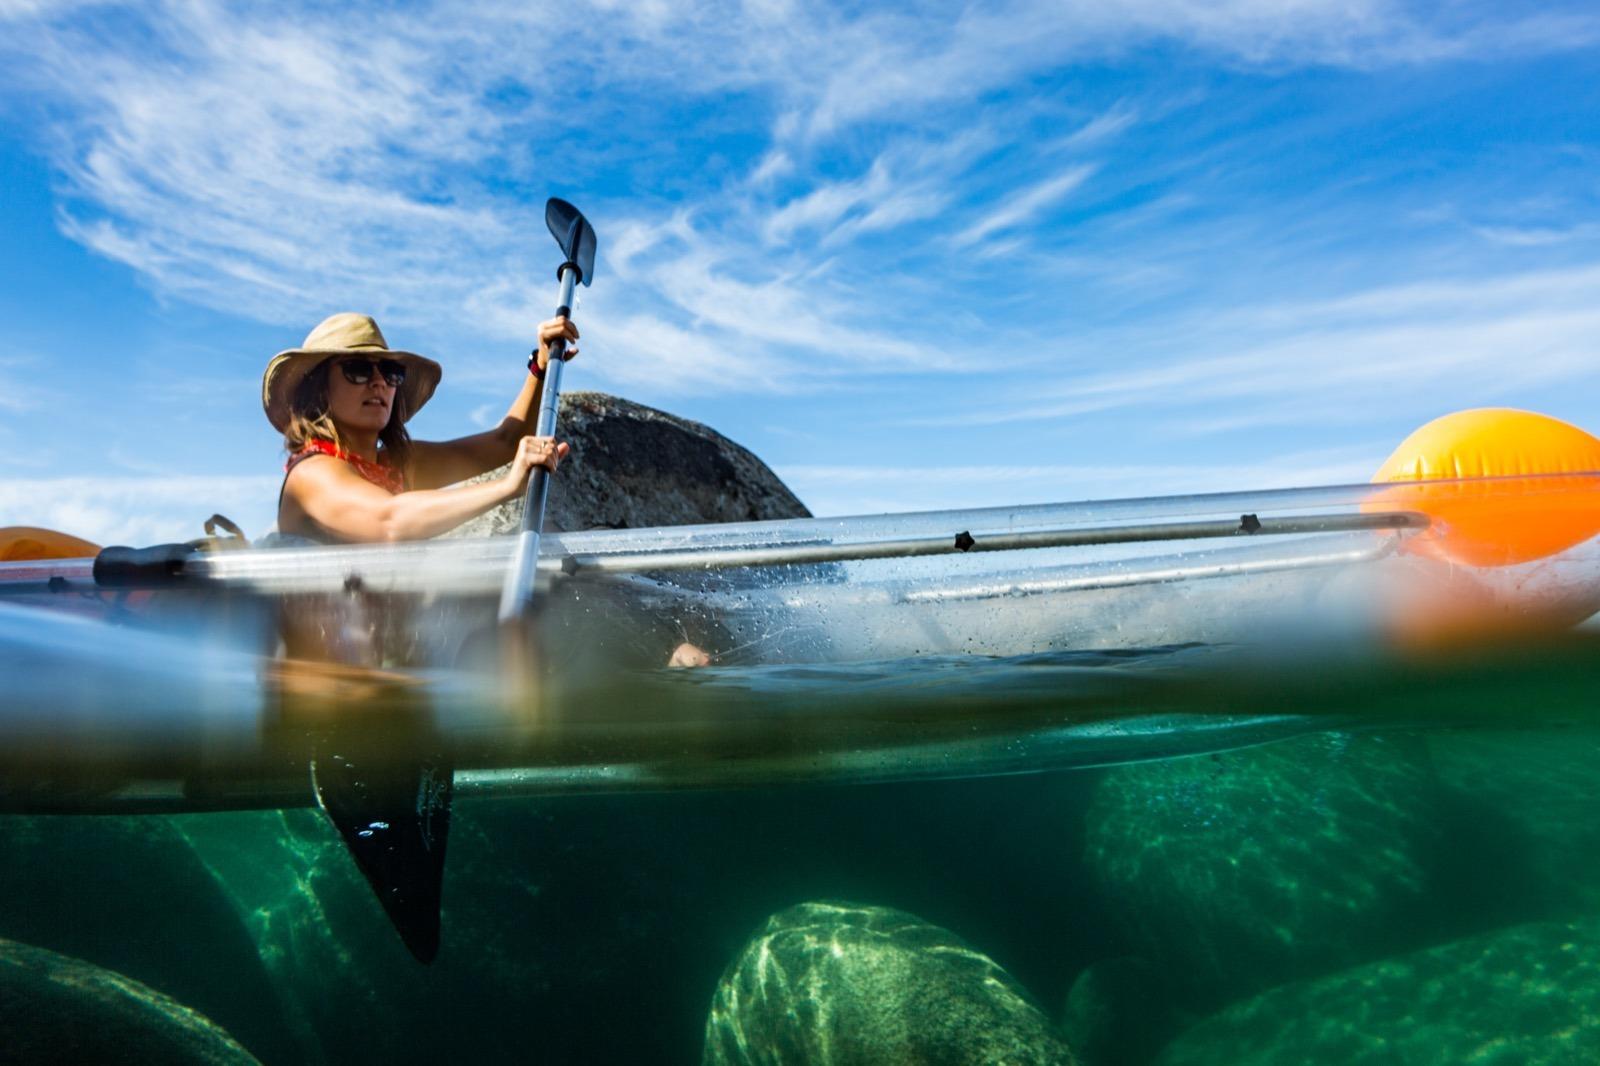 california-high-sierra-north-lake-tahoe-clear-bottom-kayak-kings-beach-2